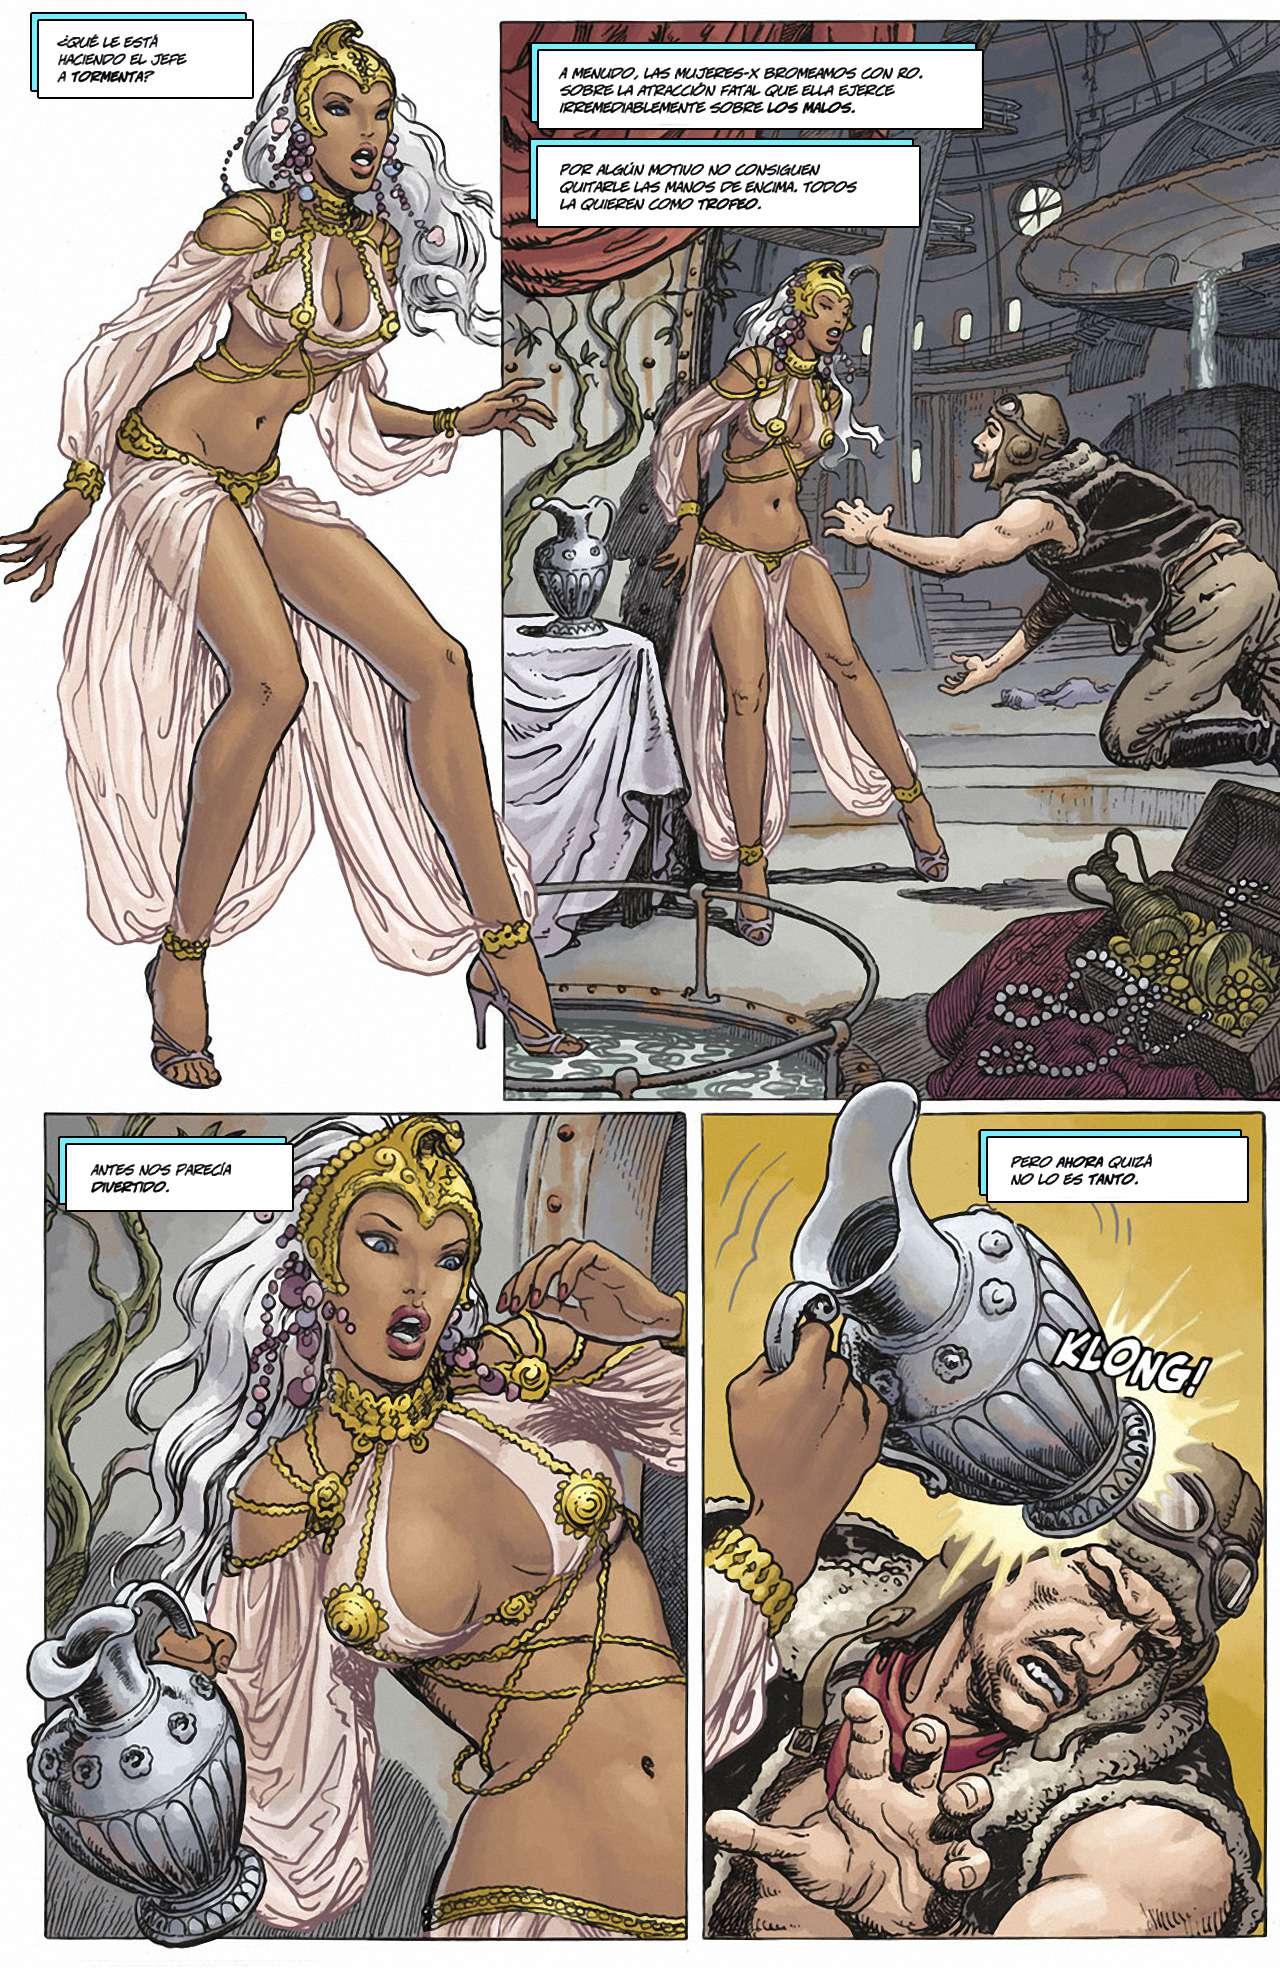 Milo Manara X-Men Mujeres en peligro